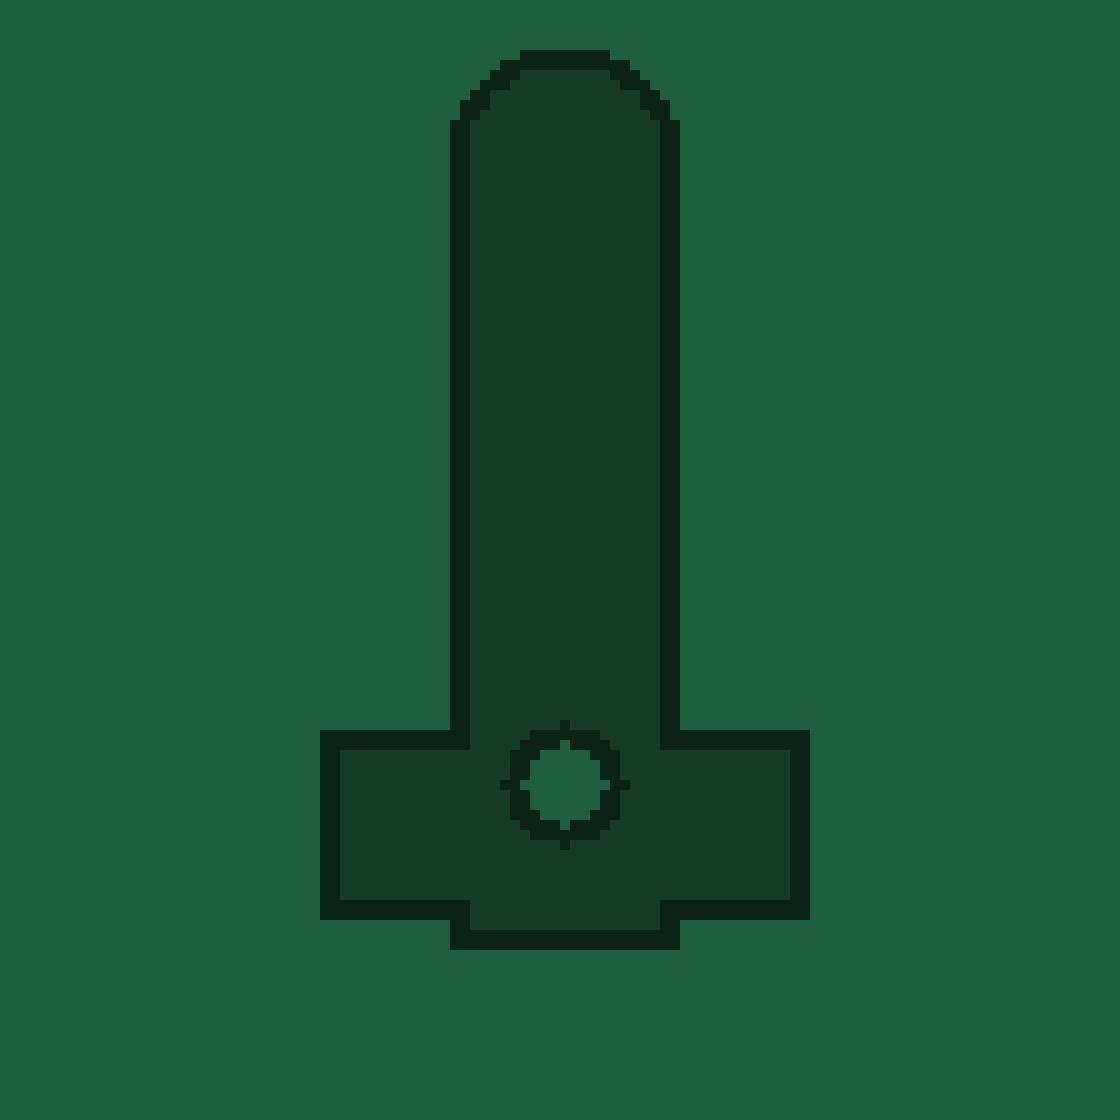 ebiten-gfx-submarine